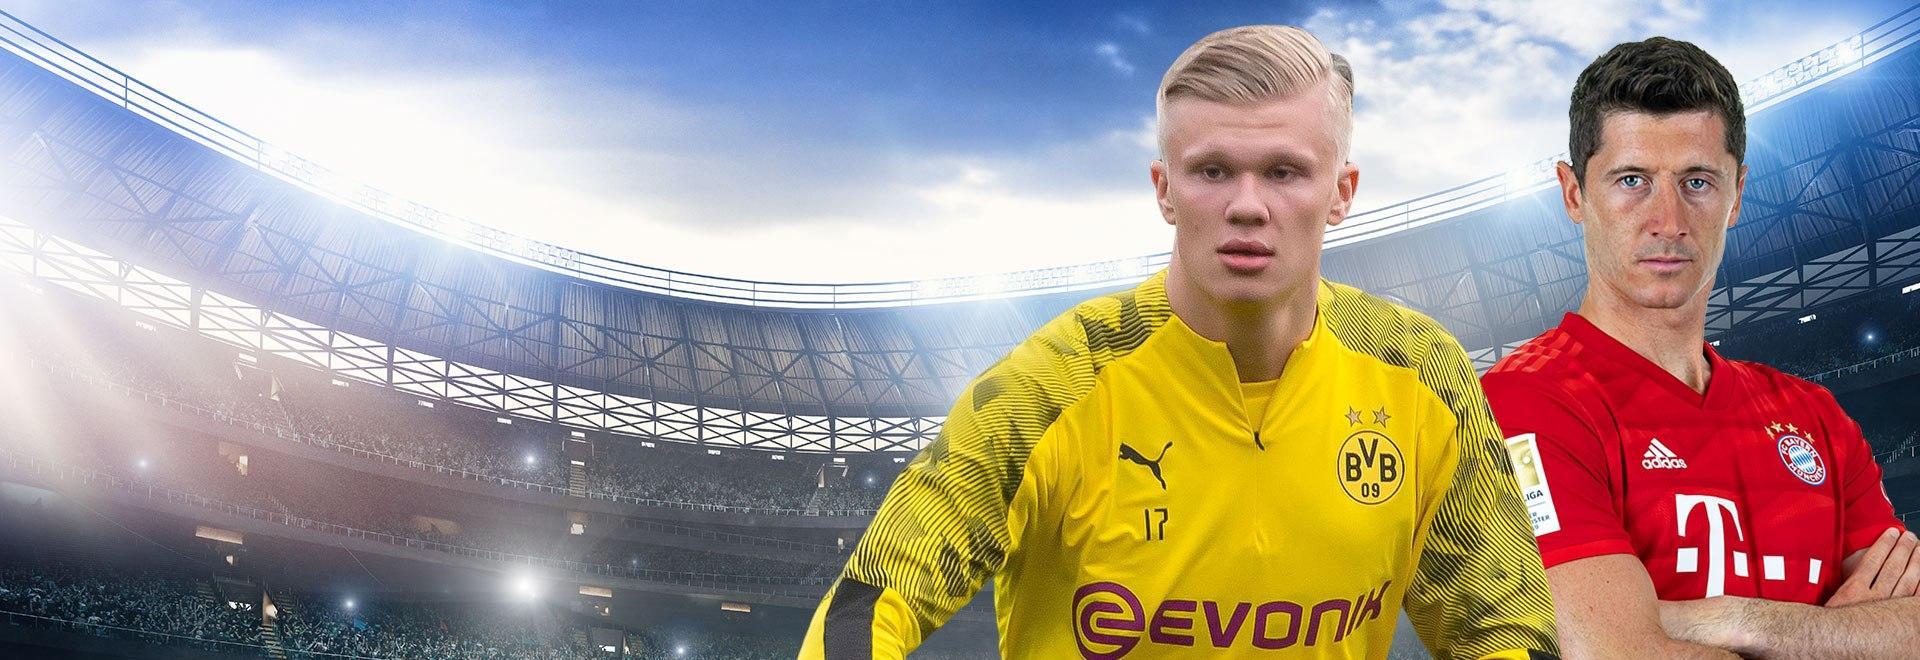 Borussia D. - Bayern M. 28a g.